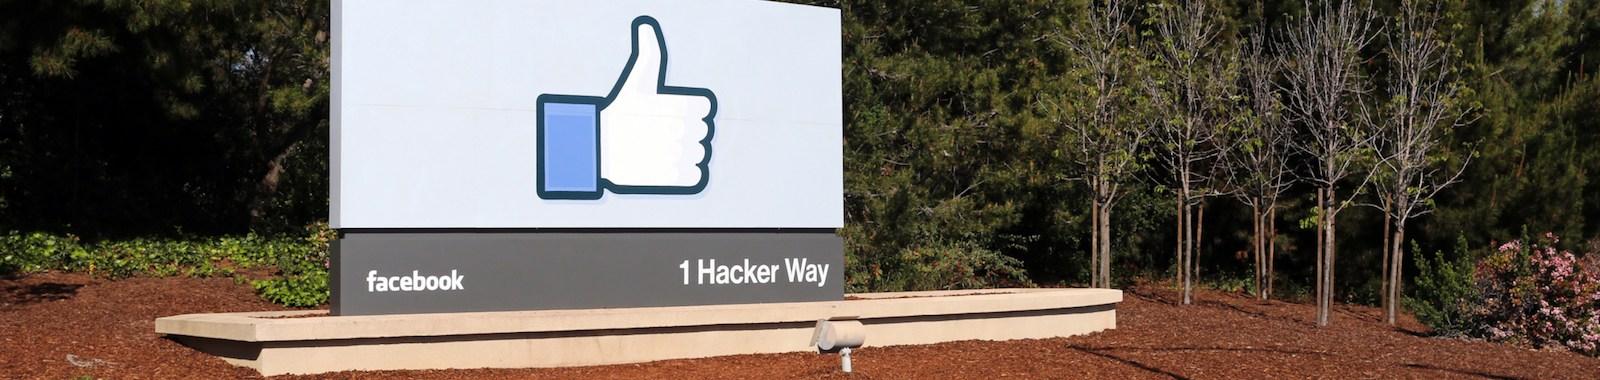 Facebook World Headquarters